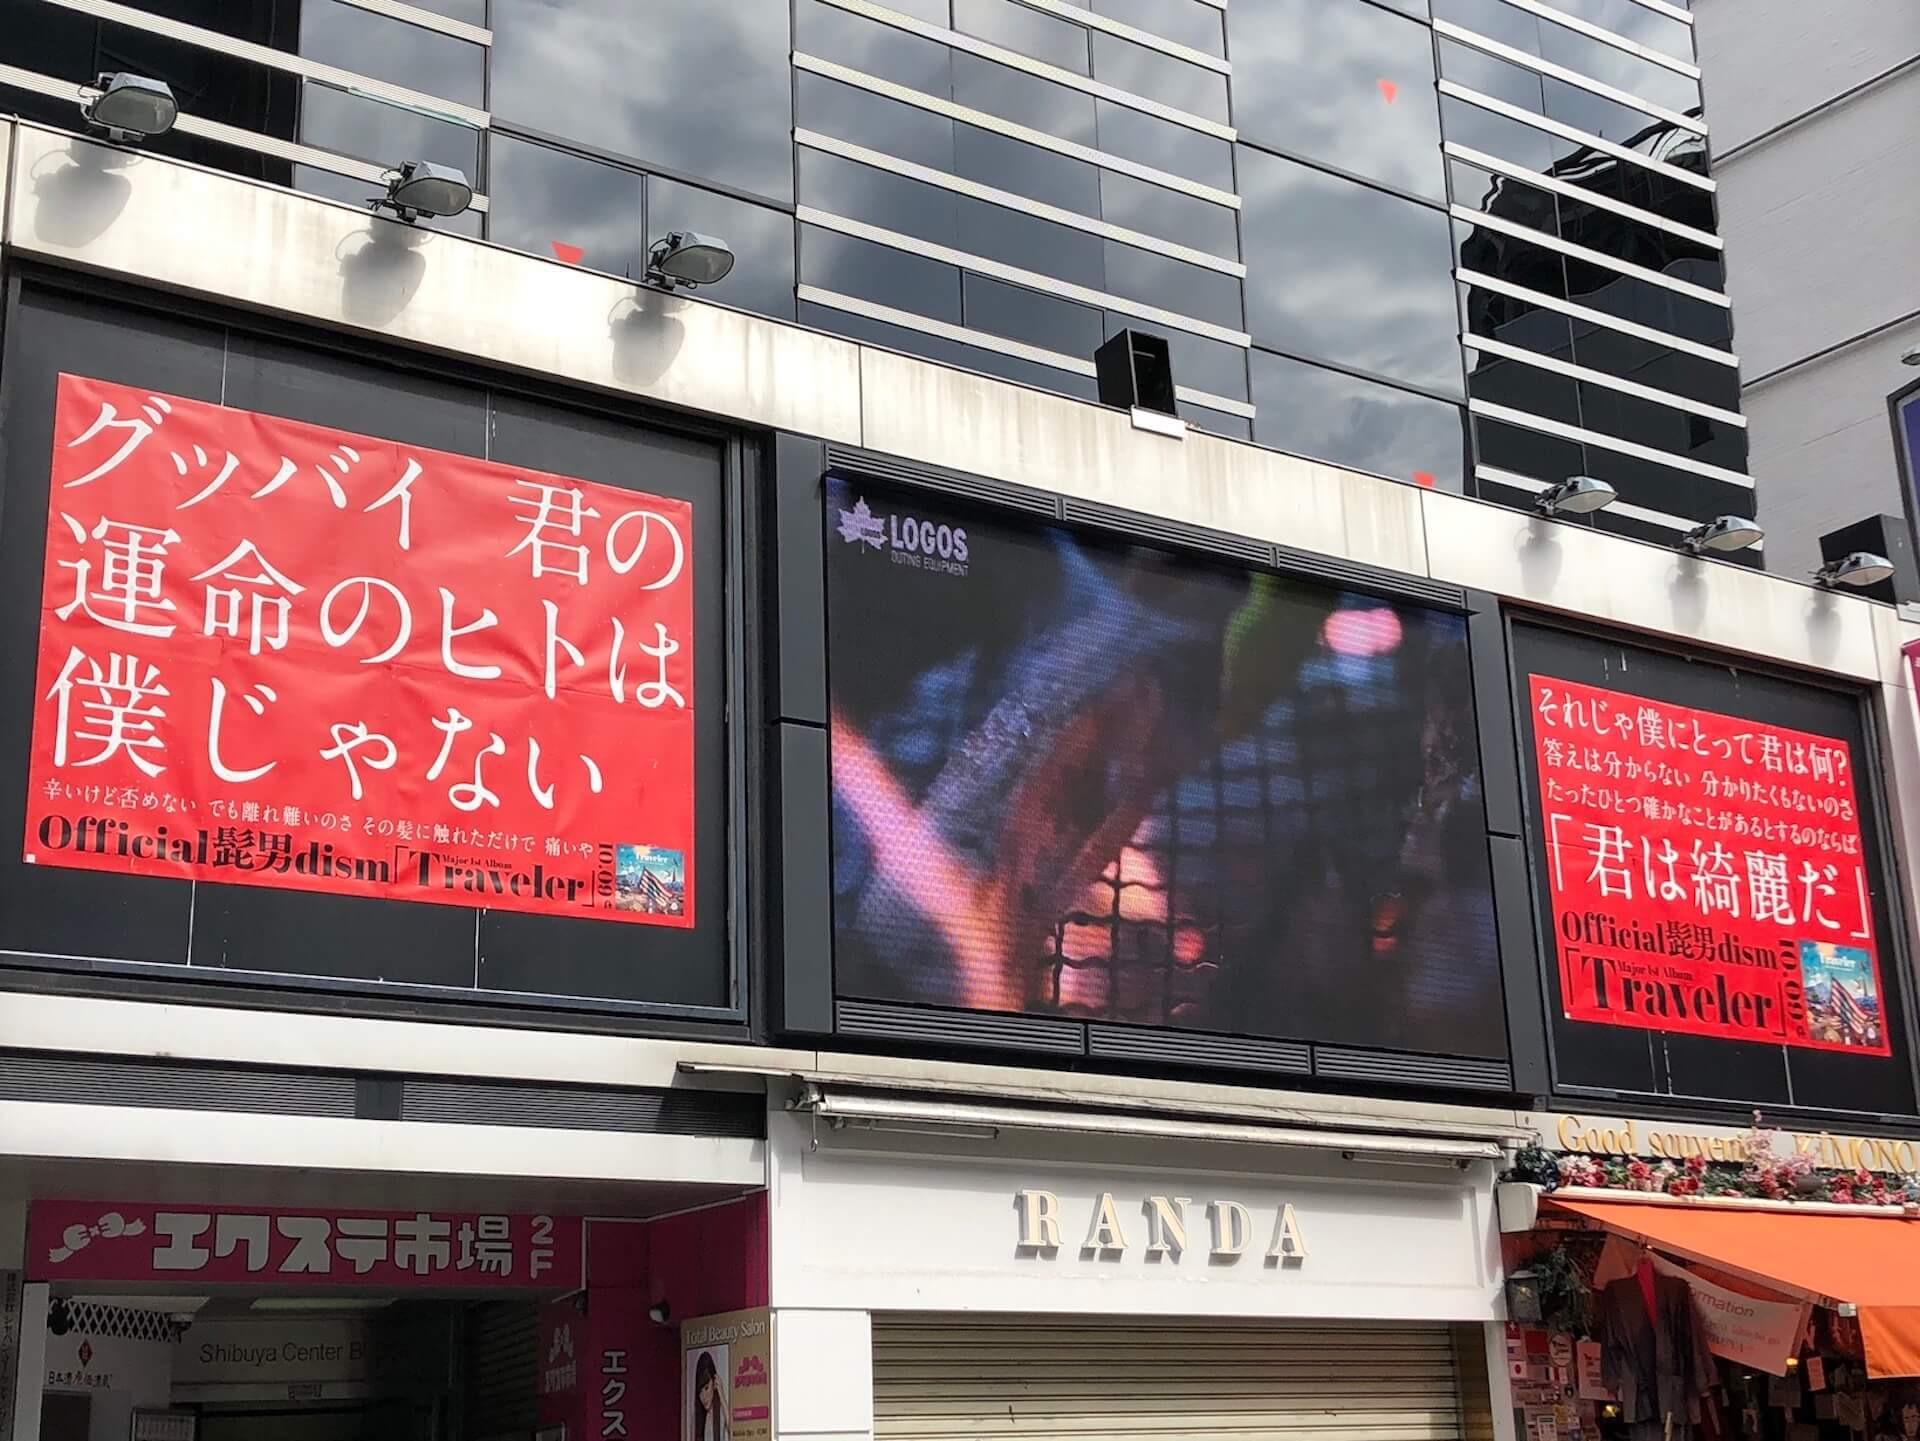 Official髭男dismが渋谷をジャック!『Traveler』発売記念、ジャックポスターが登場|渋谷某所で未発表曲の解禁も music191007_higedan_4